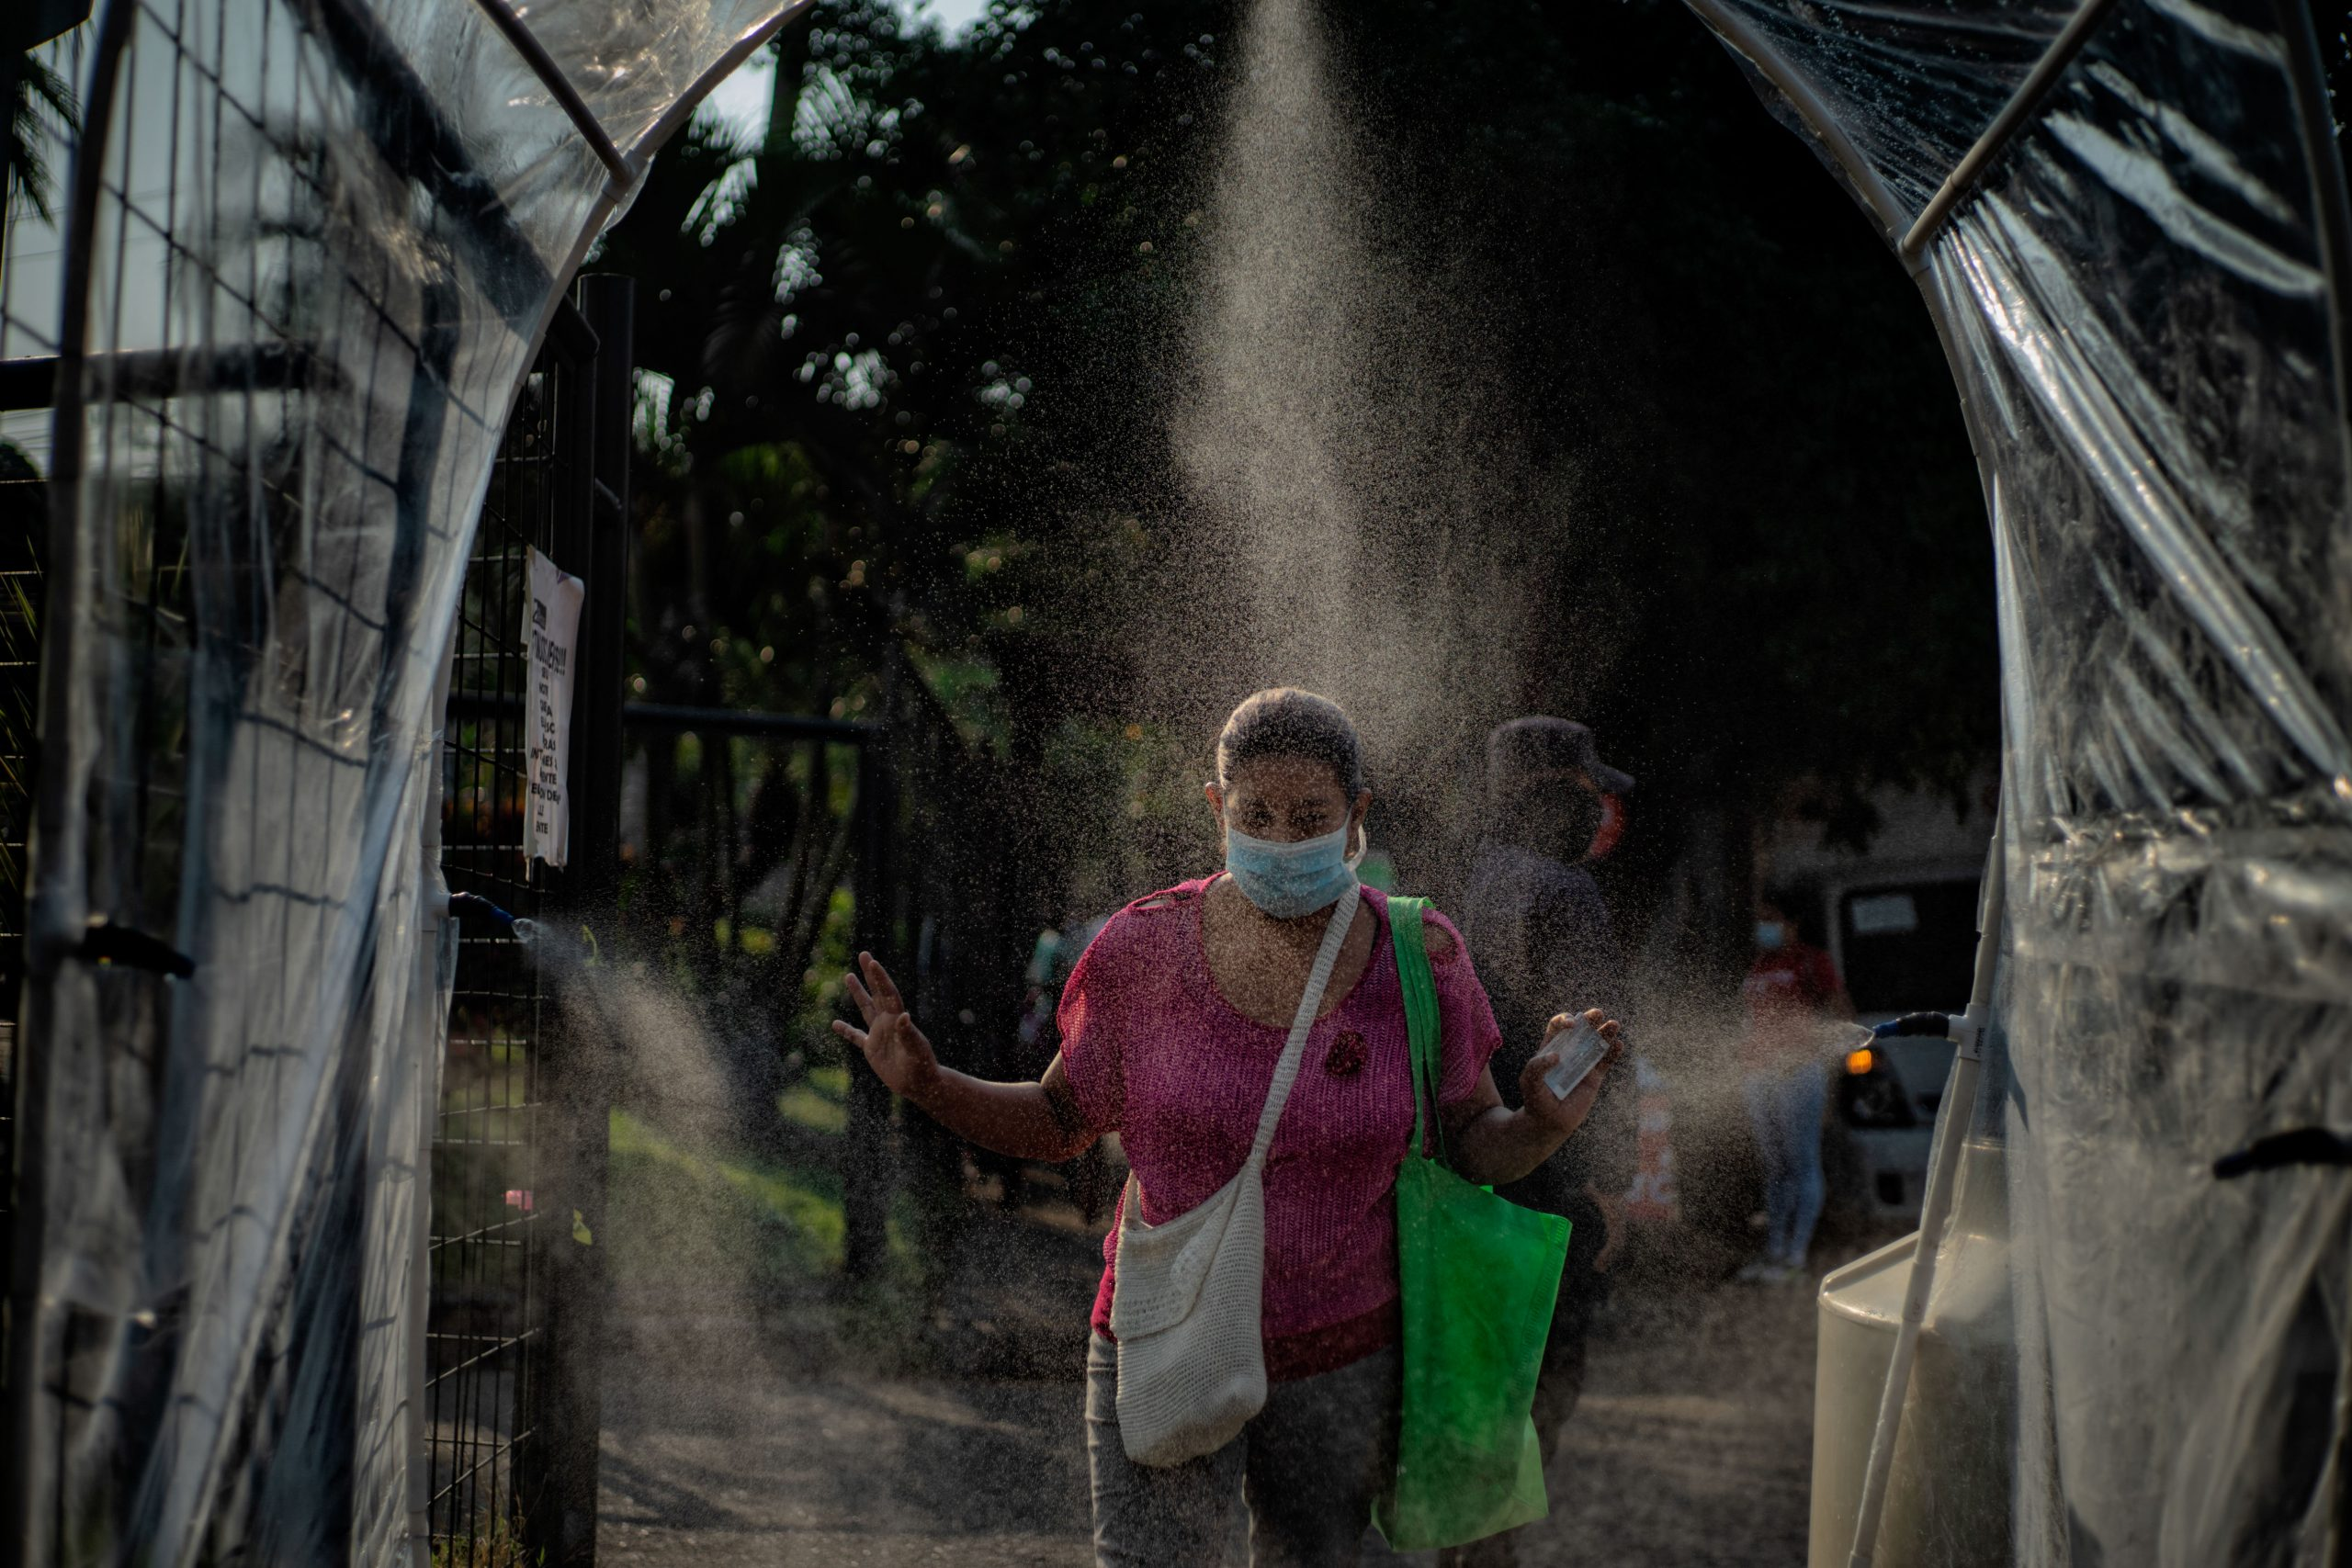 Customers walk through a sanitation tunnel